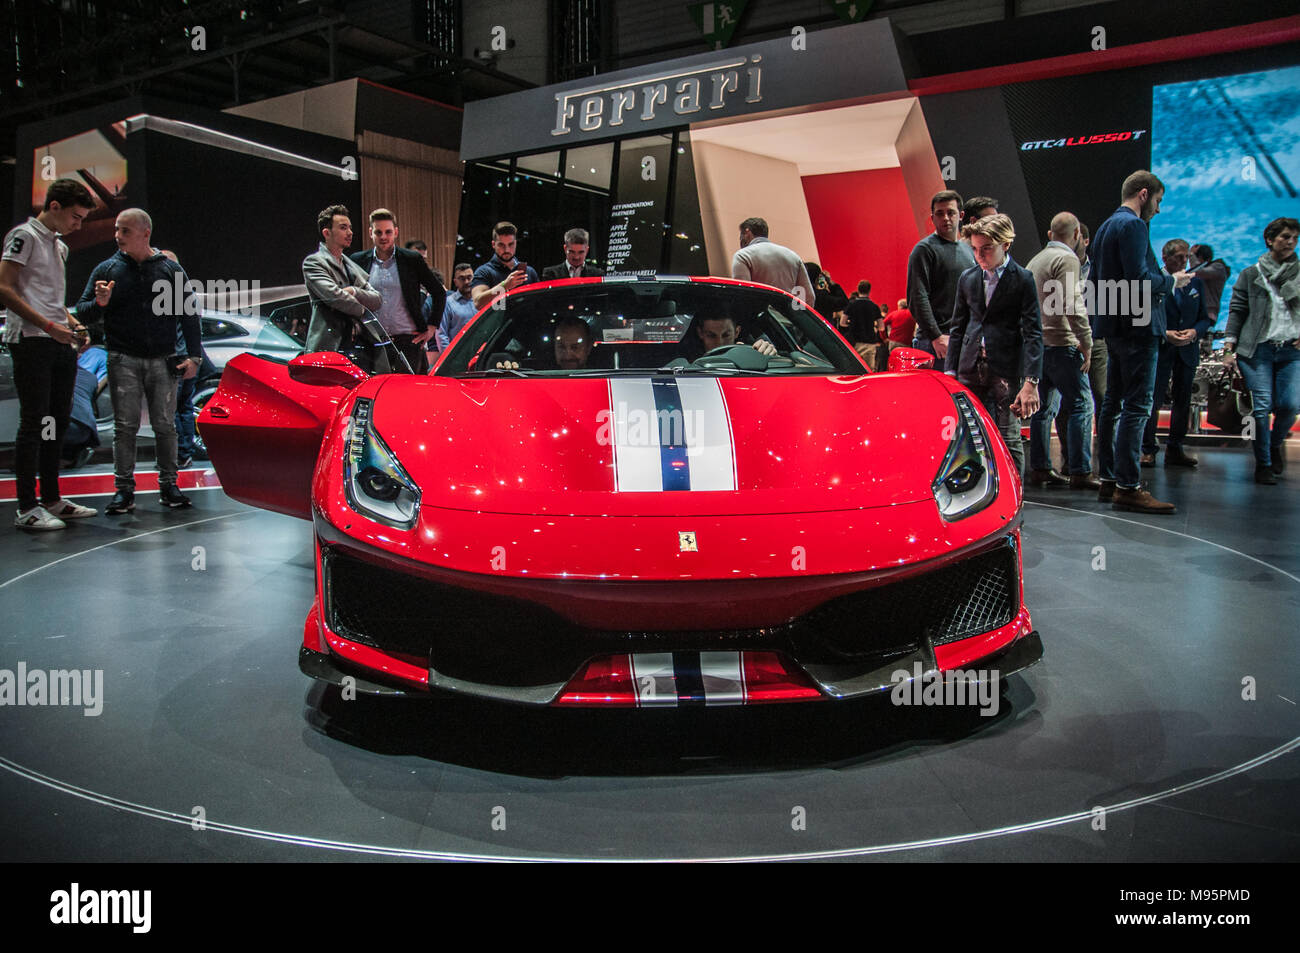 700b92d7a4 Ferrari 488 Gt3 Immagini   Ferrari 488 Gt3 Fotos Stock - Alamy